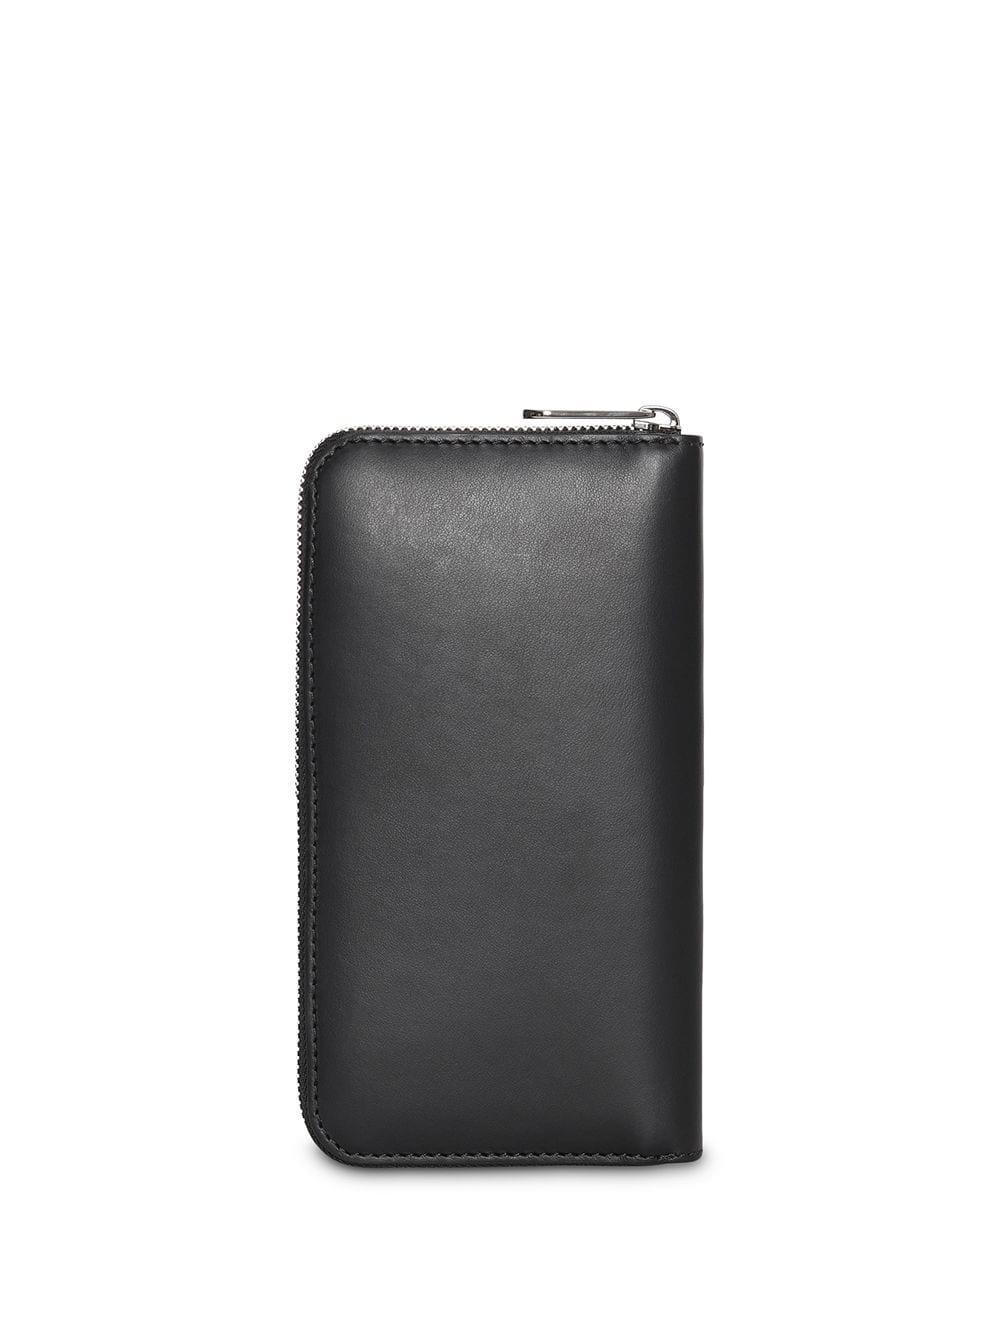 dadba6c5f41 Lyst - Burberry Cavendish Wallet in Black for Men - Save 7%